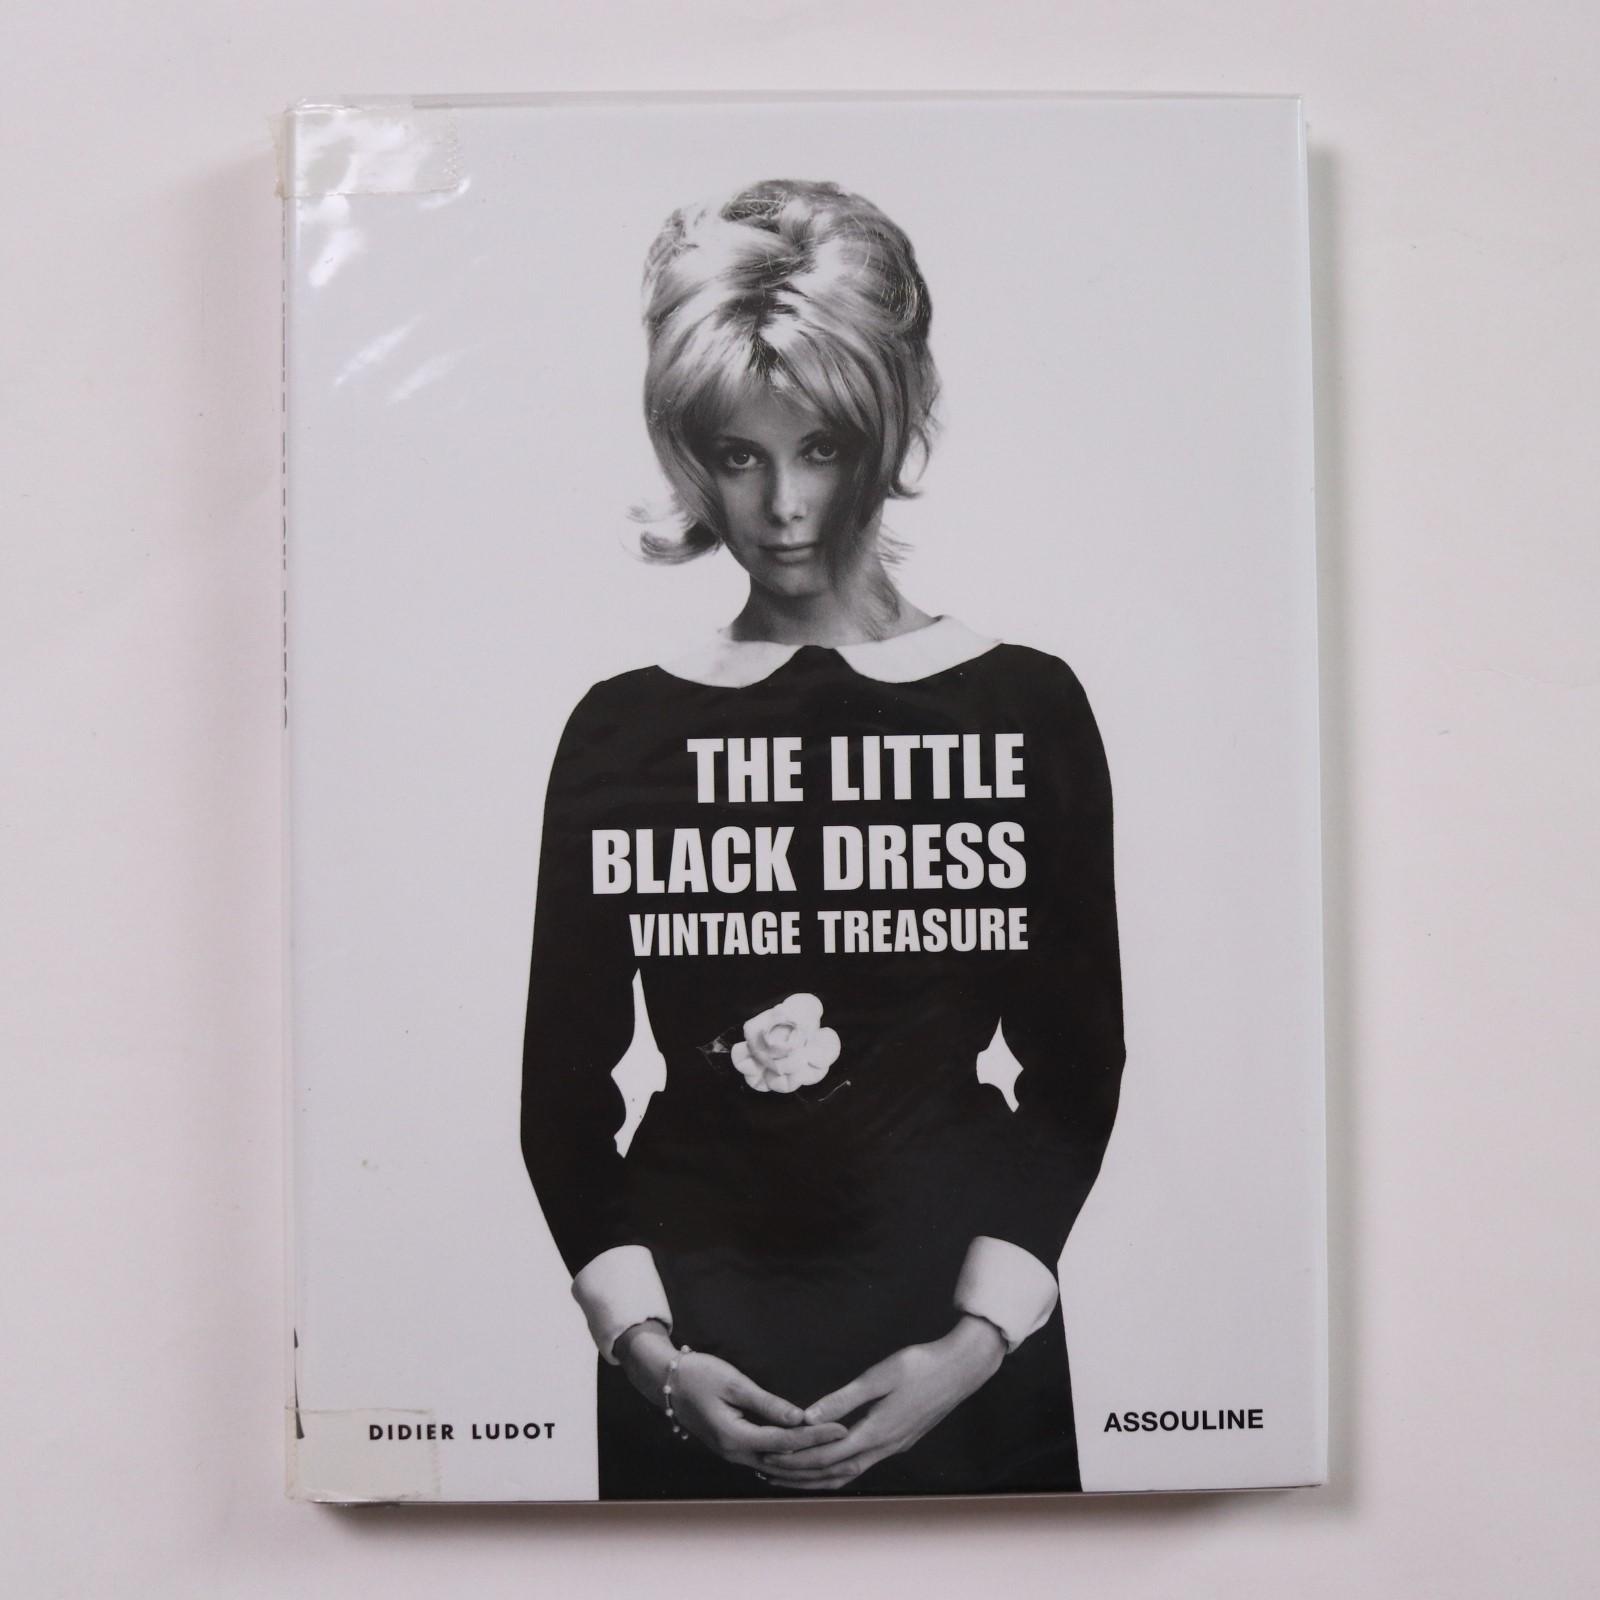 Little Black Dress: Vintage Treasure / Didier Ludot